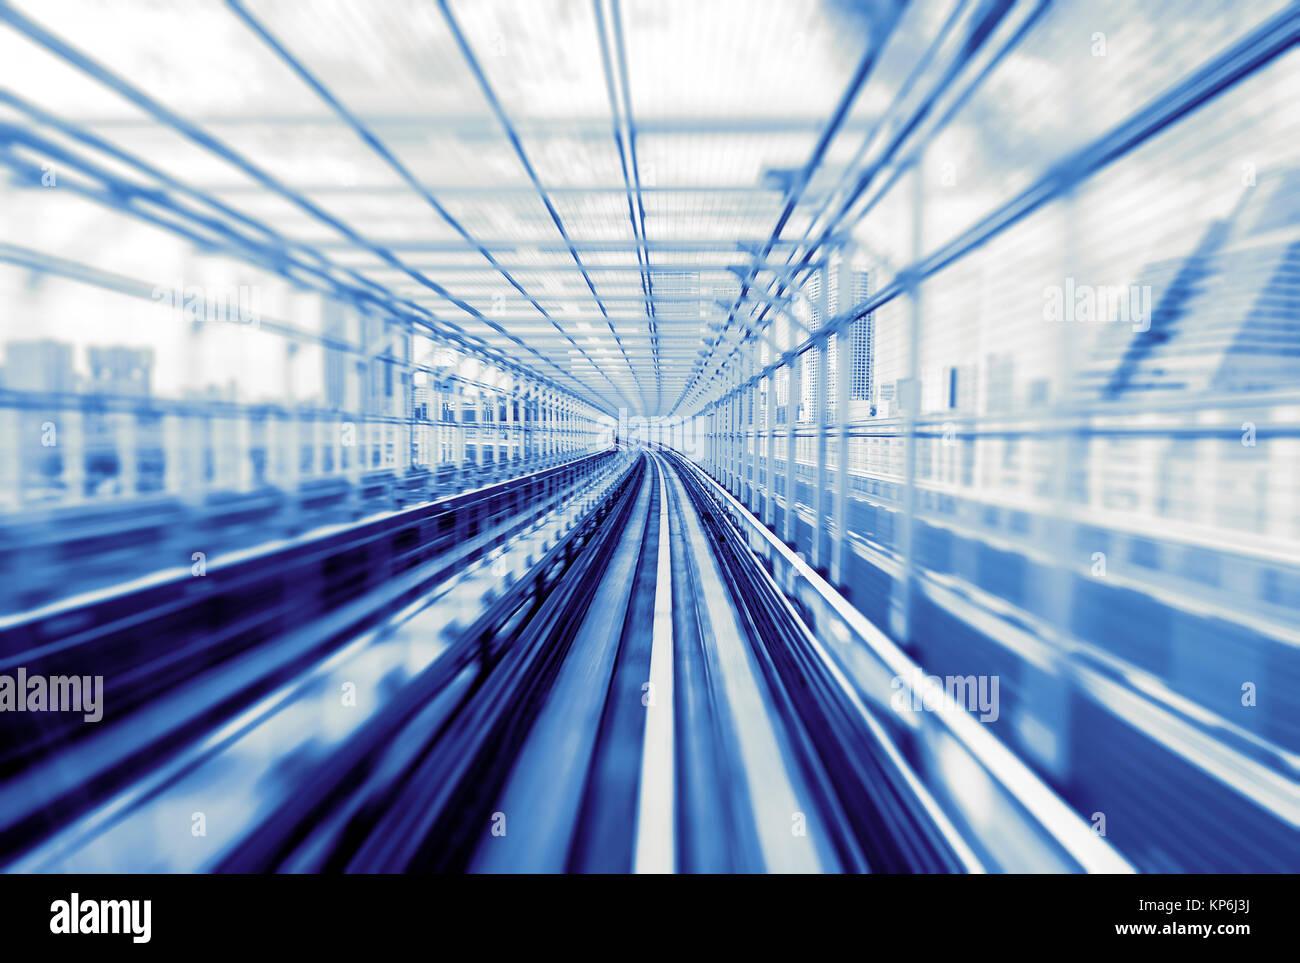 Speeding Train Track - Stock Image